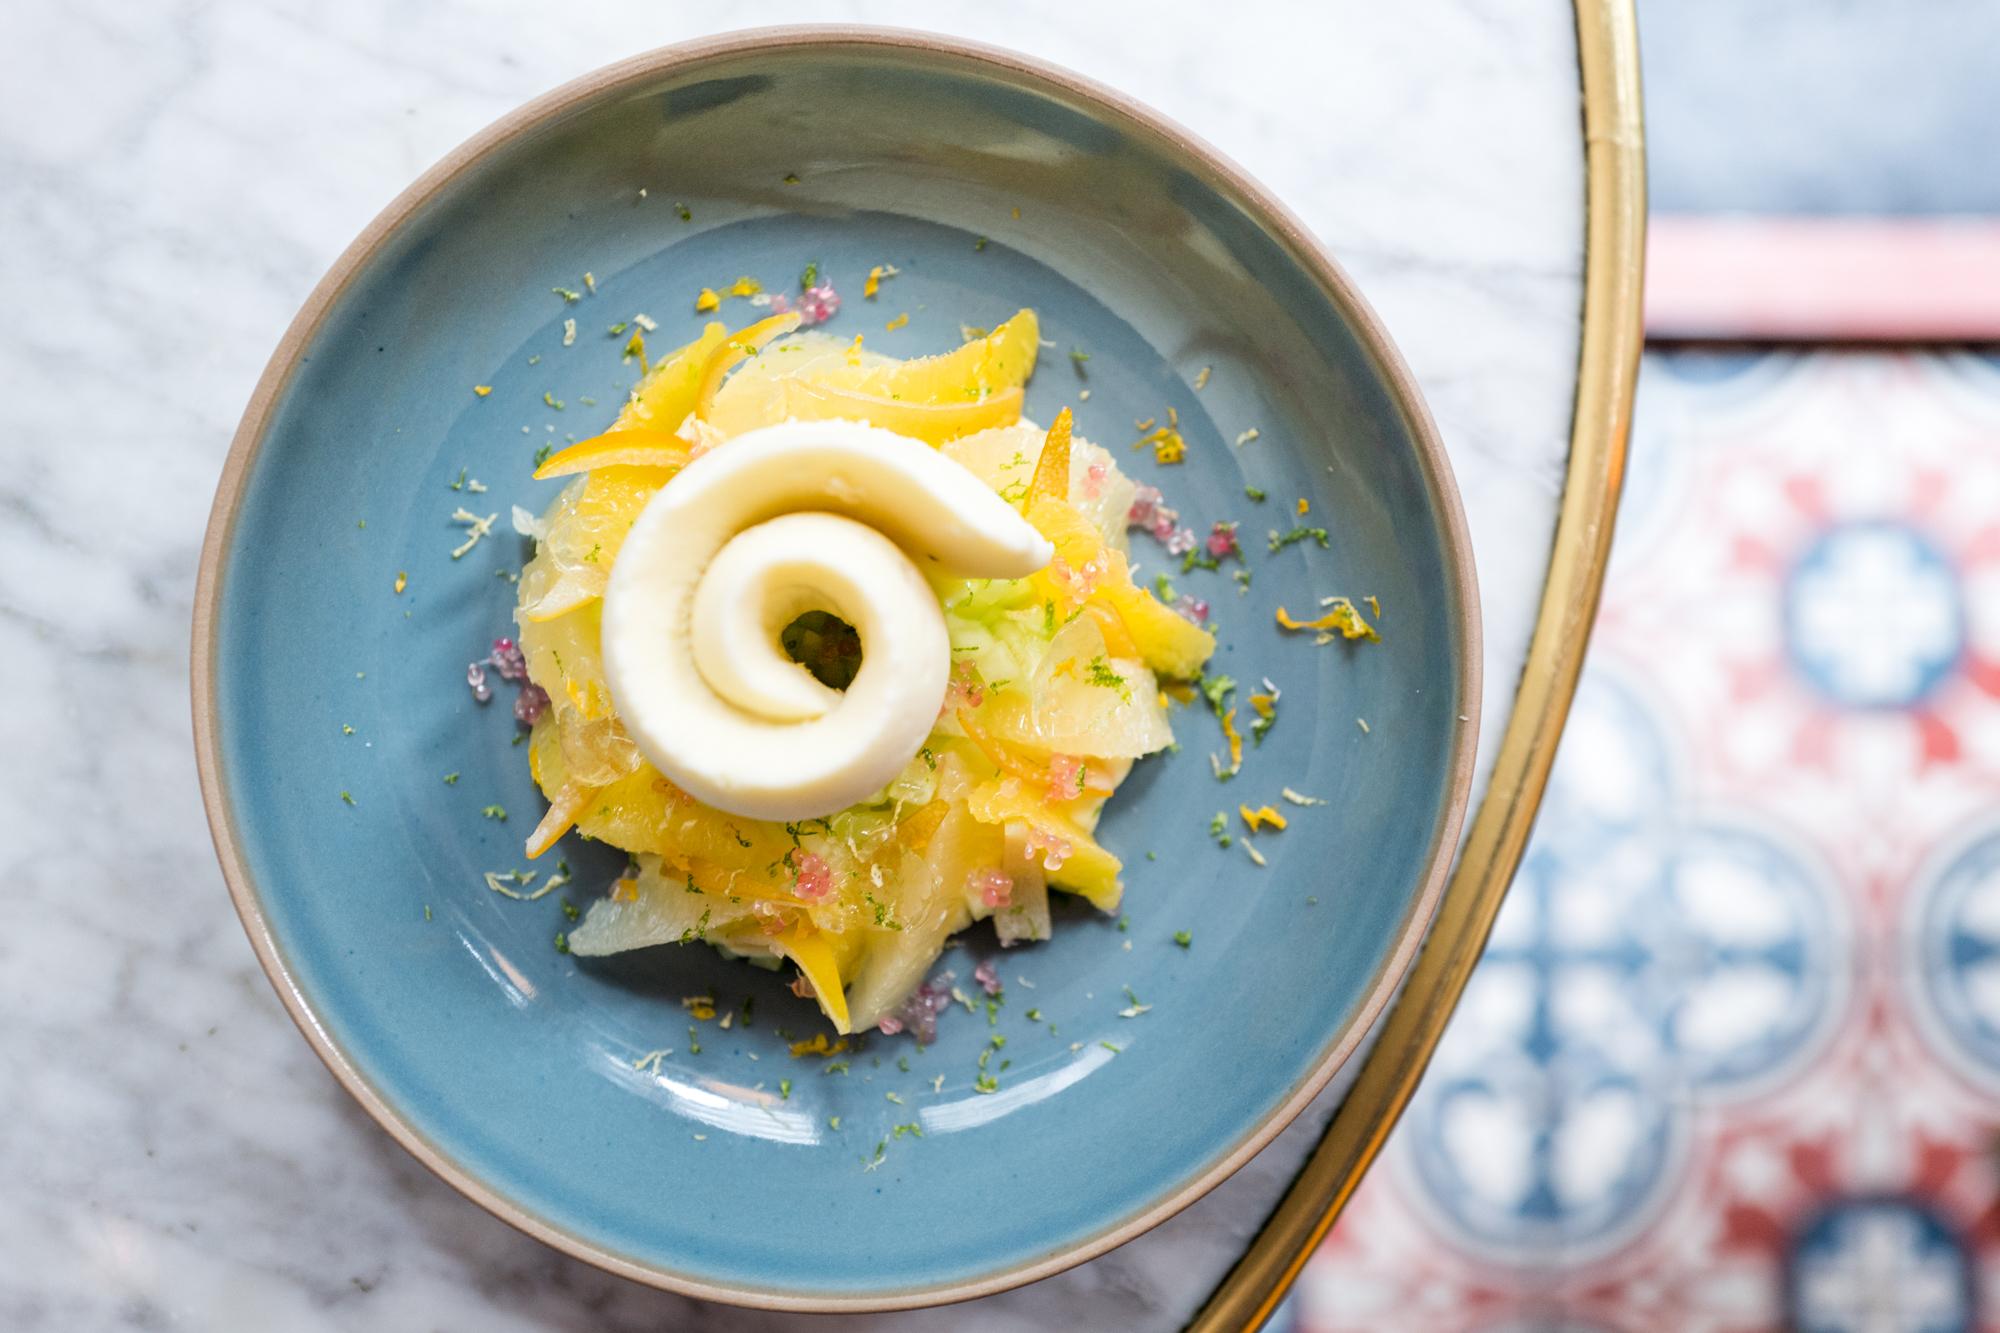 How Chef Thomas Padovani Makes Benoit's Sensational Lemon Curd Dessert